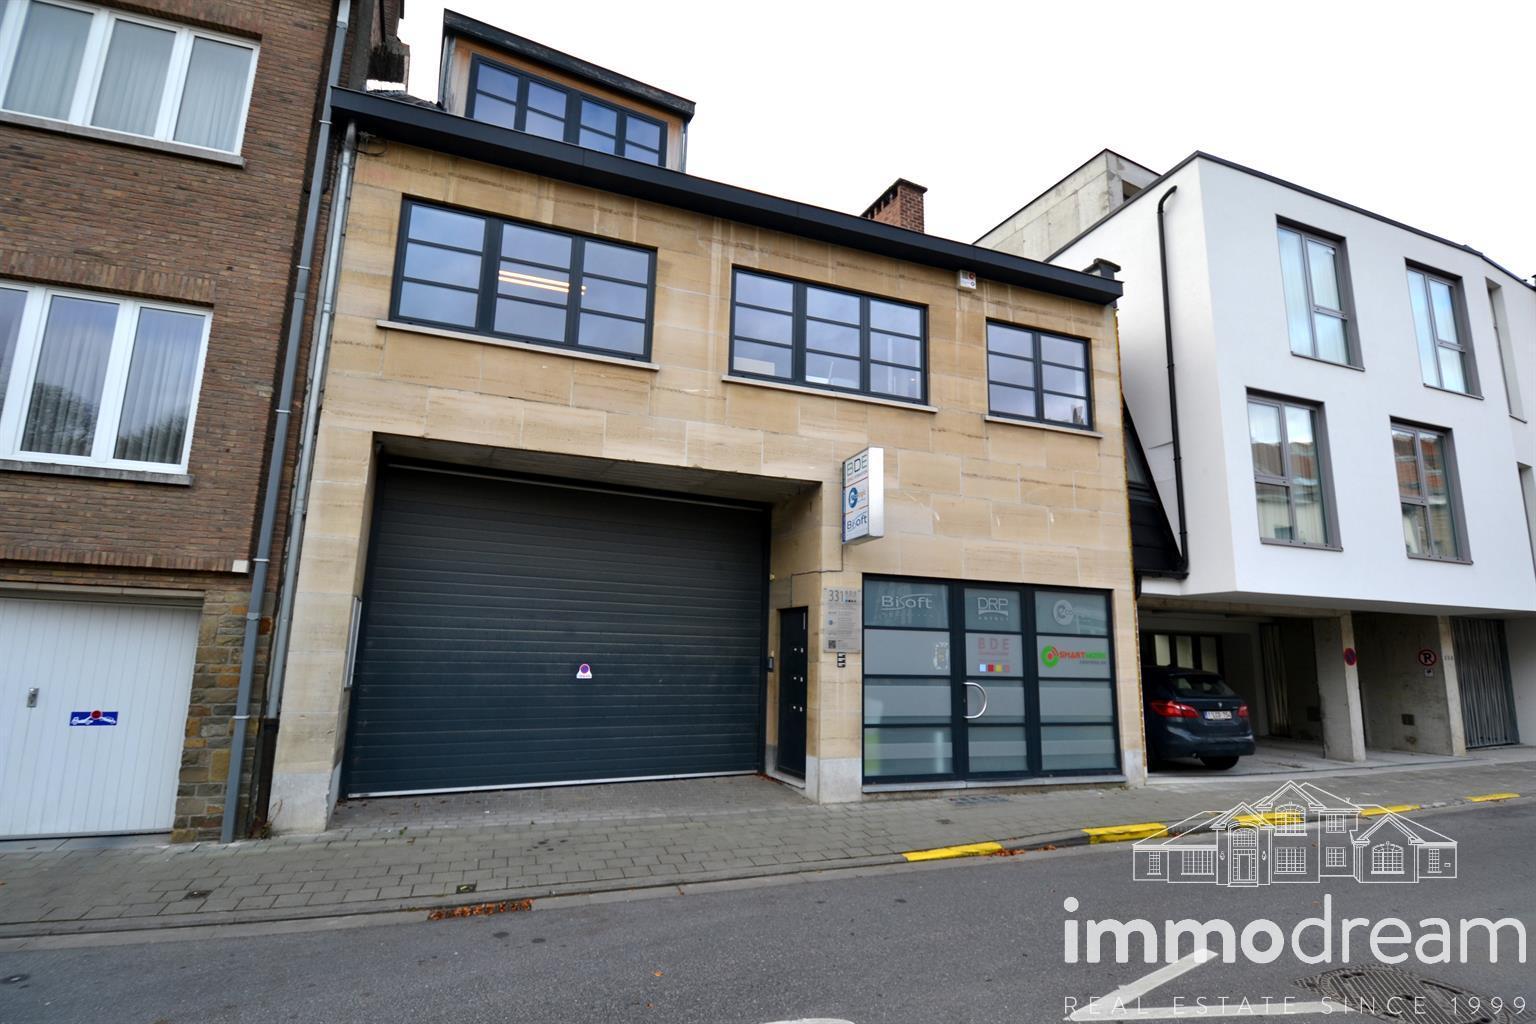 Mixt building off + res. - Woluwe-Saint-Lambert - #4025861-0